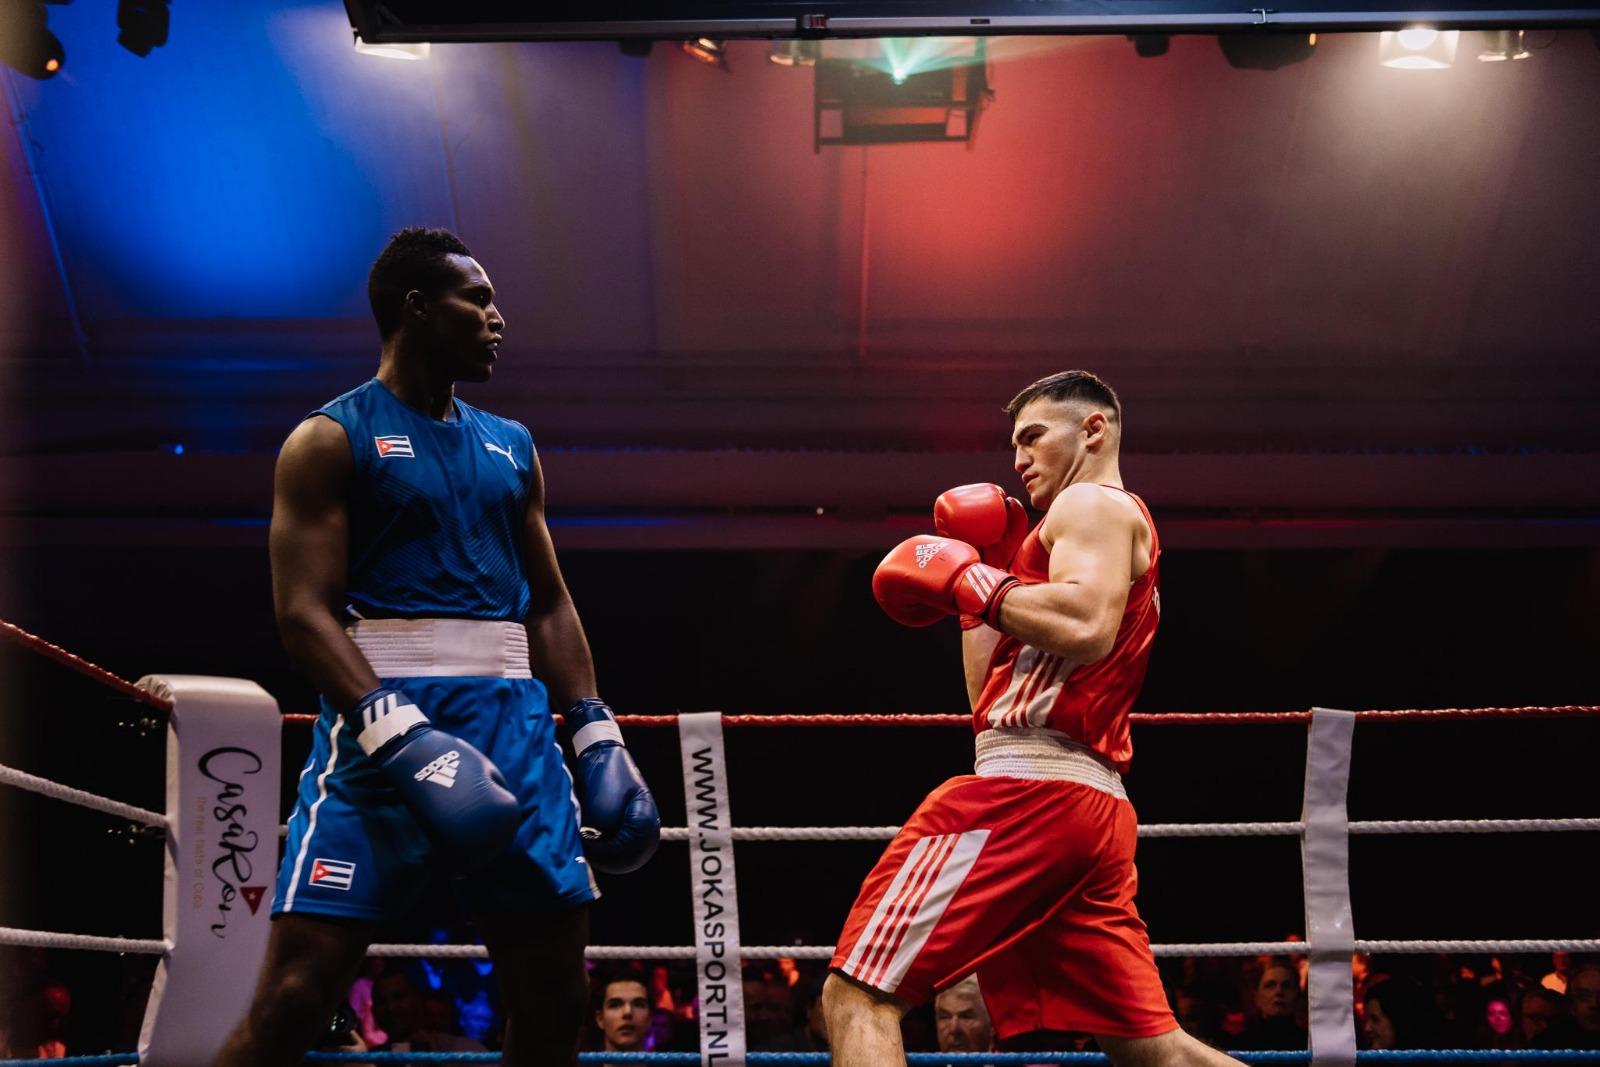 World Port Boxing 2017